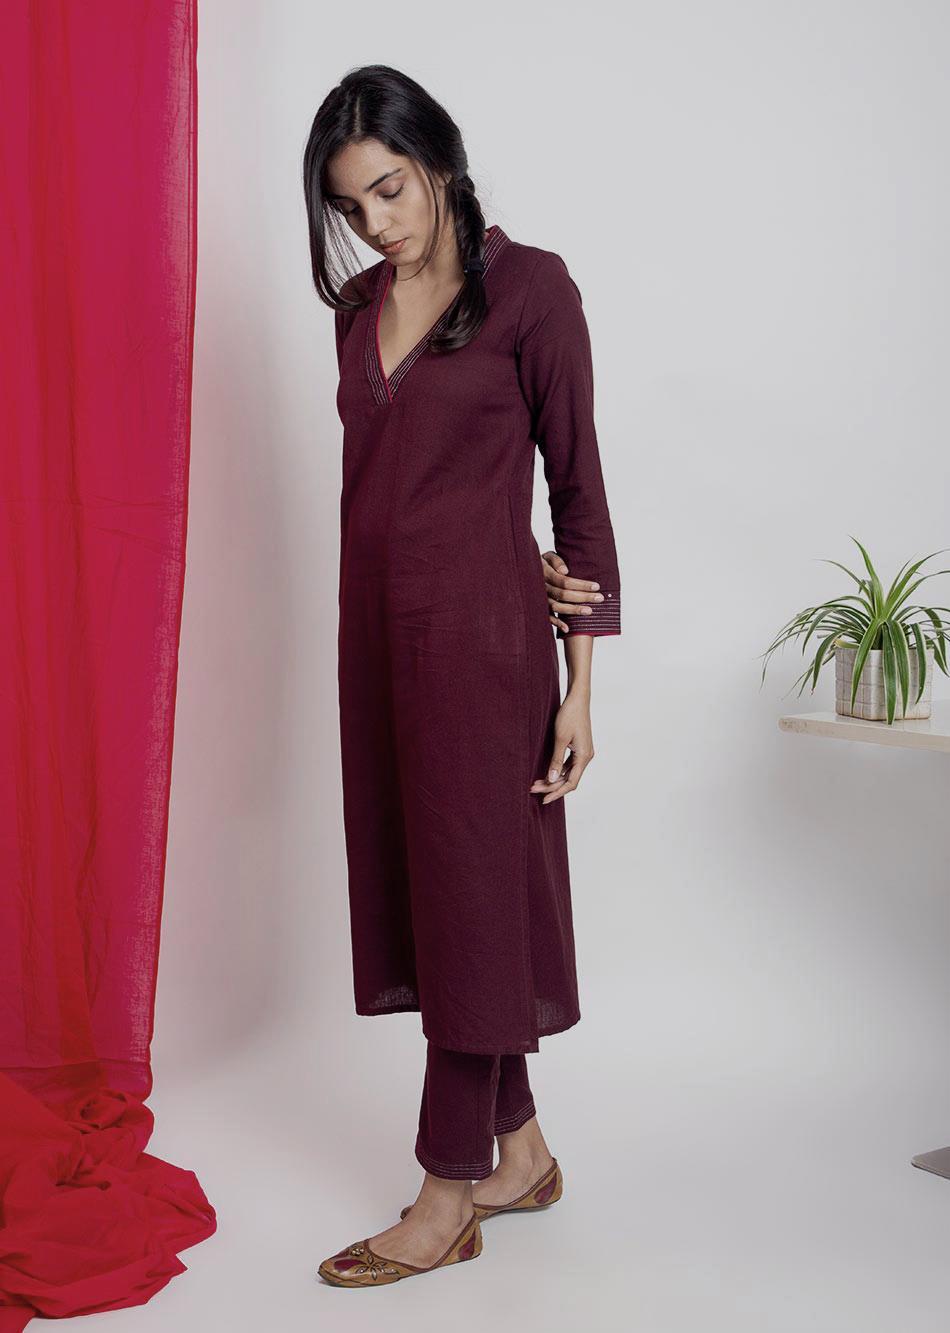 Noor(Set of 2) By Jovi Fashion